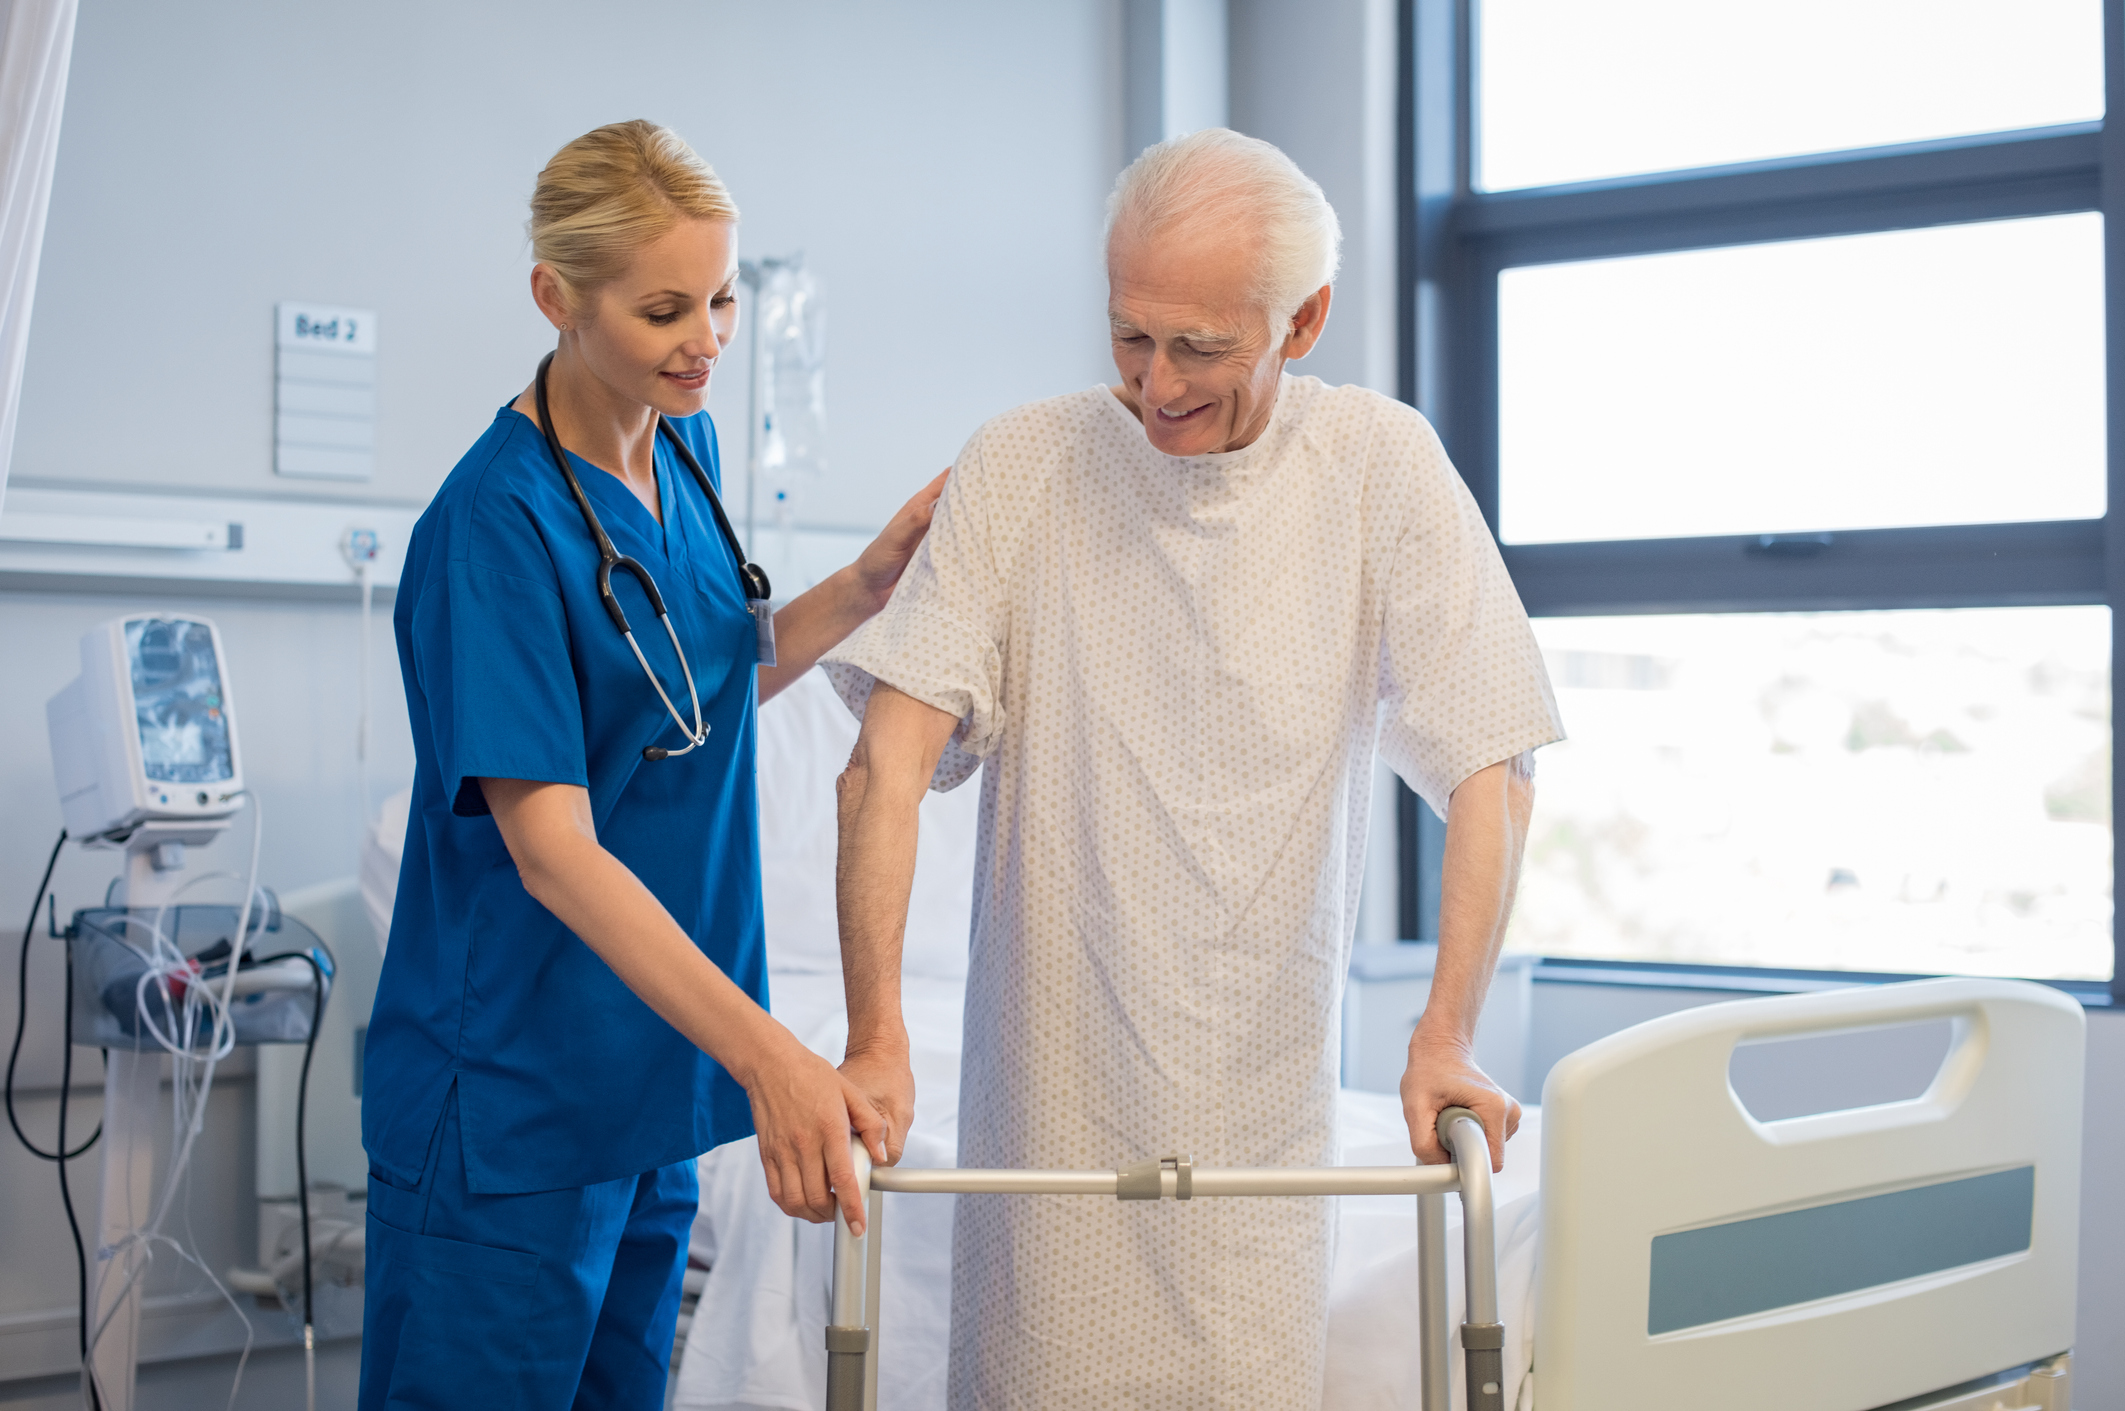 Nurse helping senior man in facility with walker